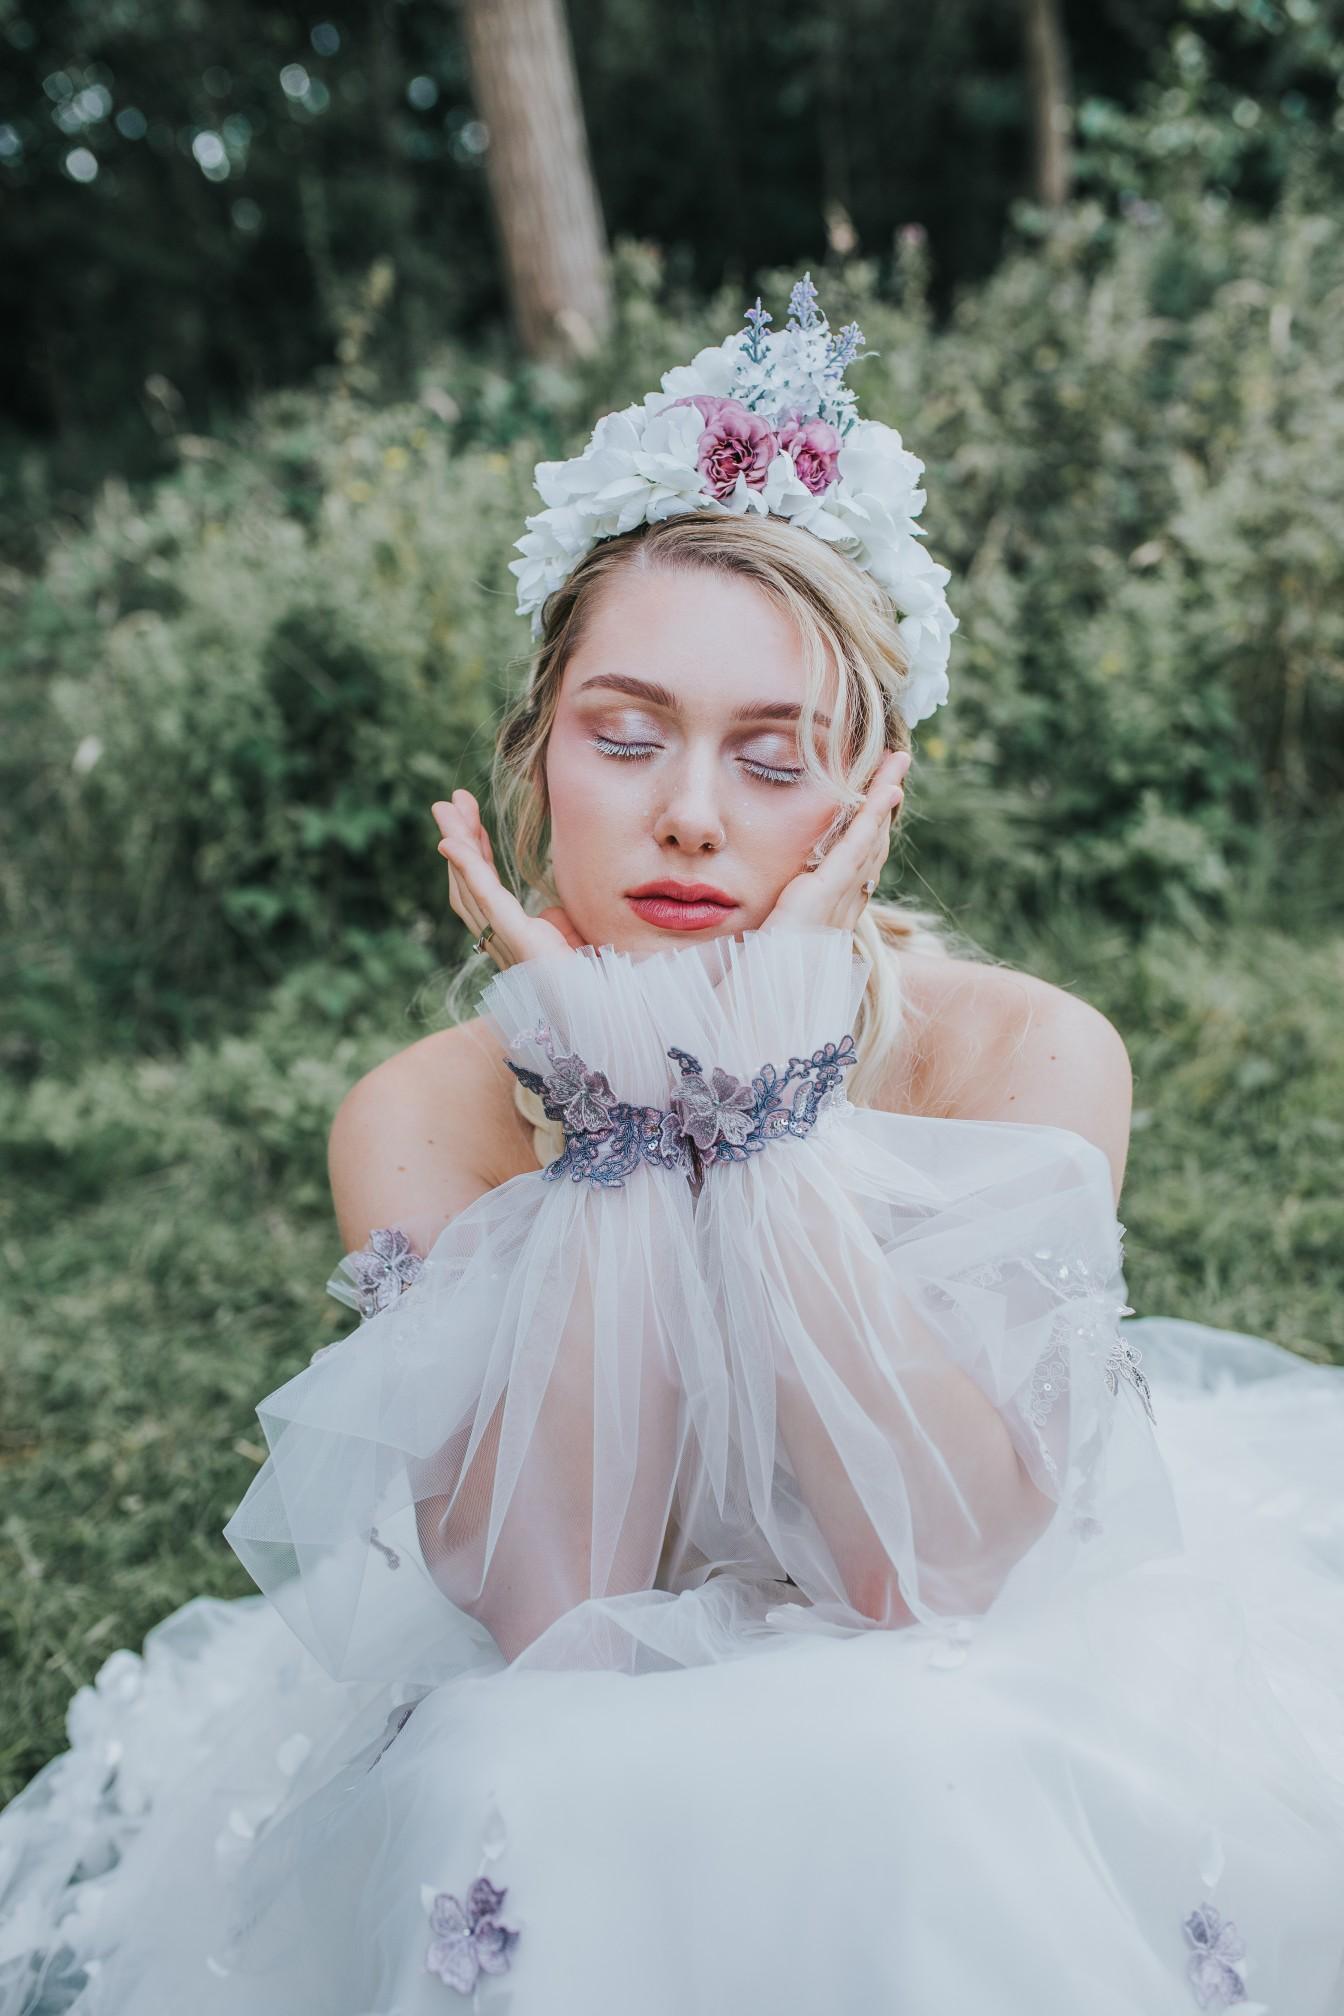 fairy wedding - whimsical wedding - magical wedding - elegant wedding dress - magical bridal look- ethereal bride